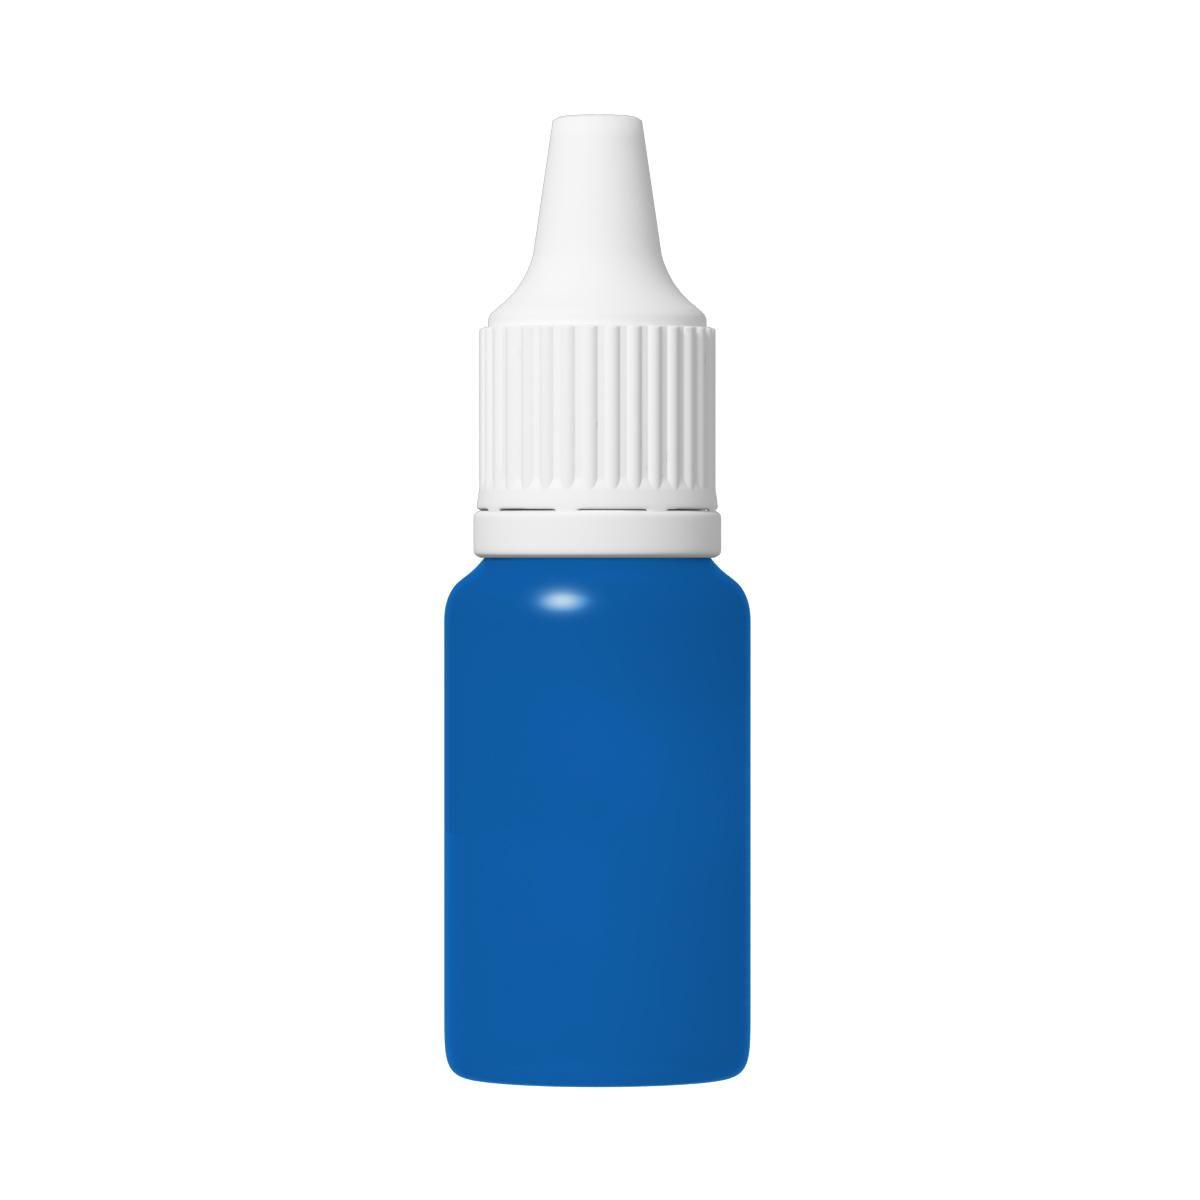 TFC Silikonfarbe Farbpaste Silikon Kautschuk RAL5015 neon leuchthimmelblau sky blue